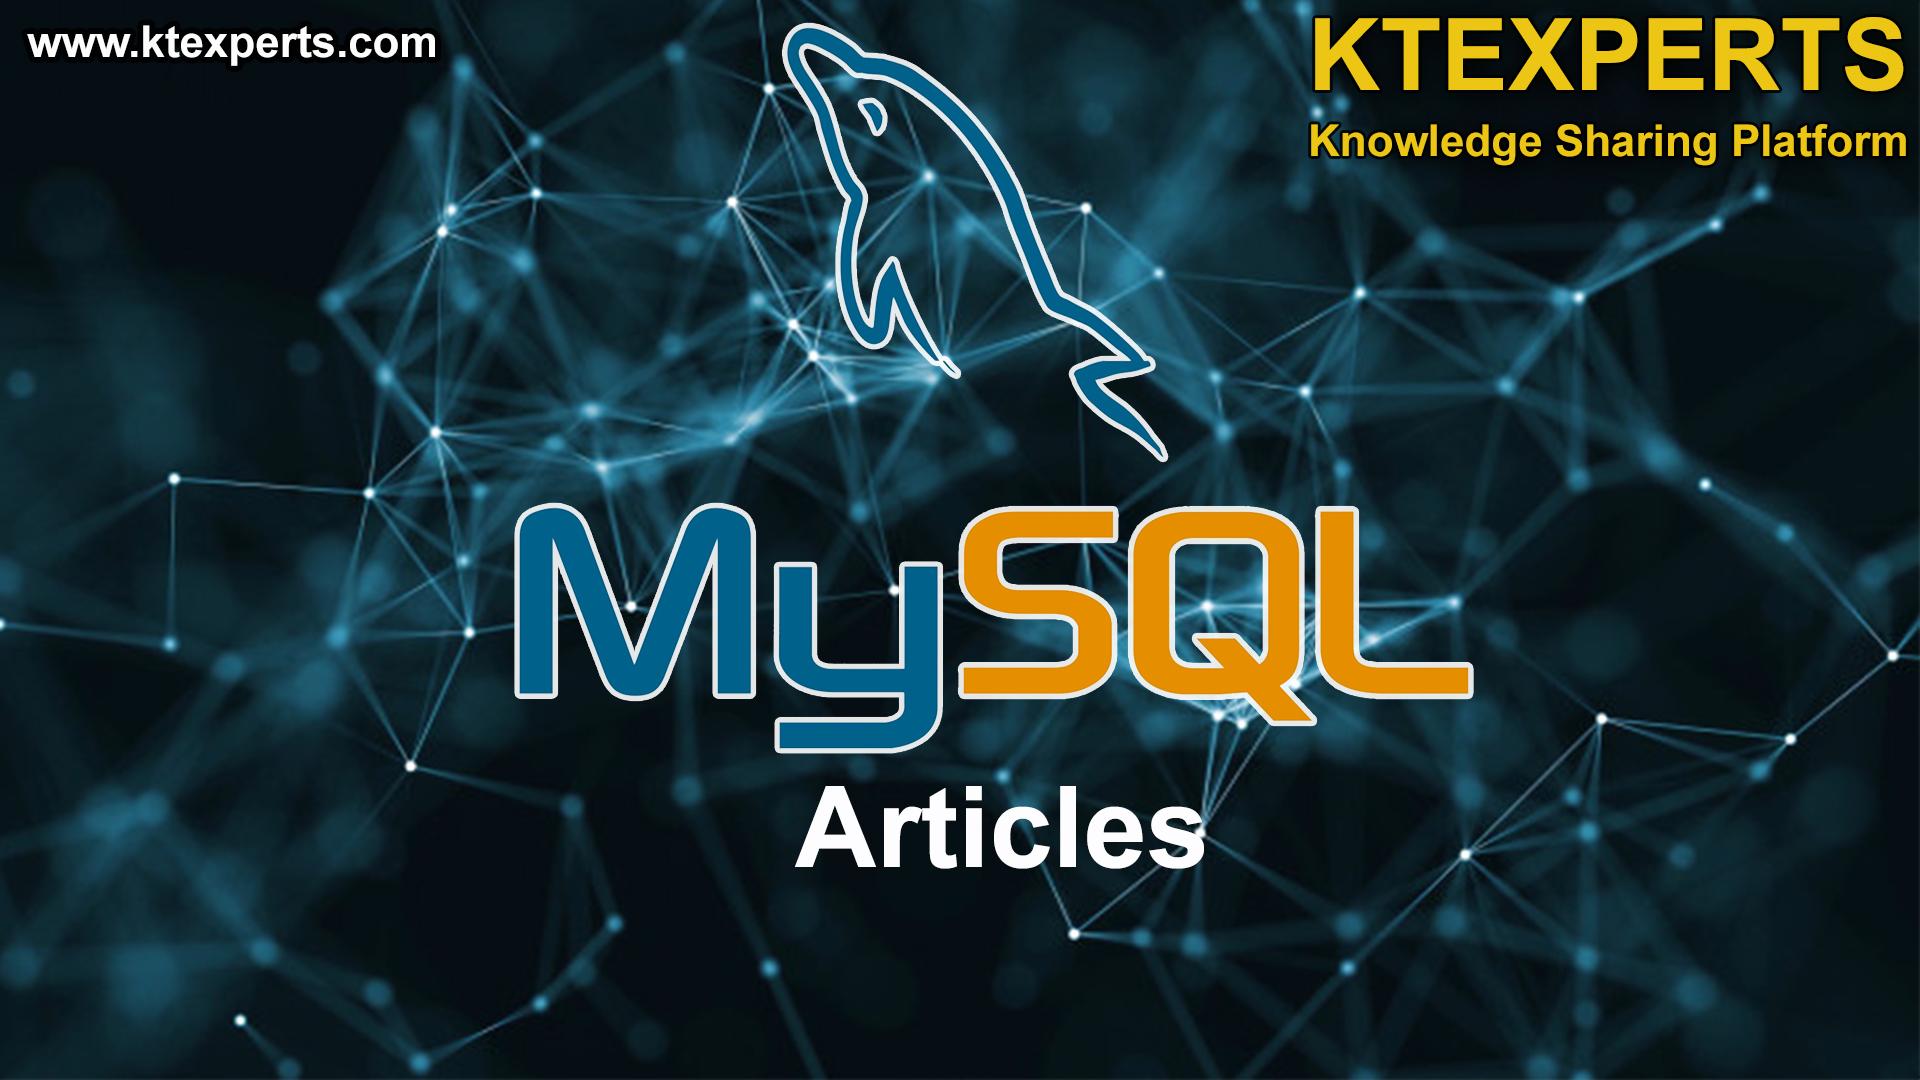 MySQL ARTICLES